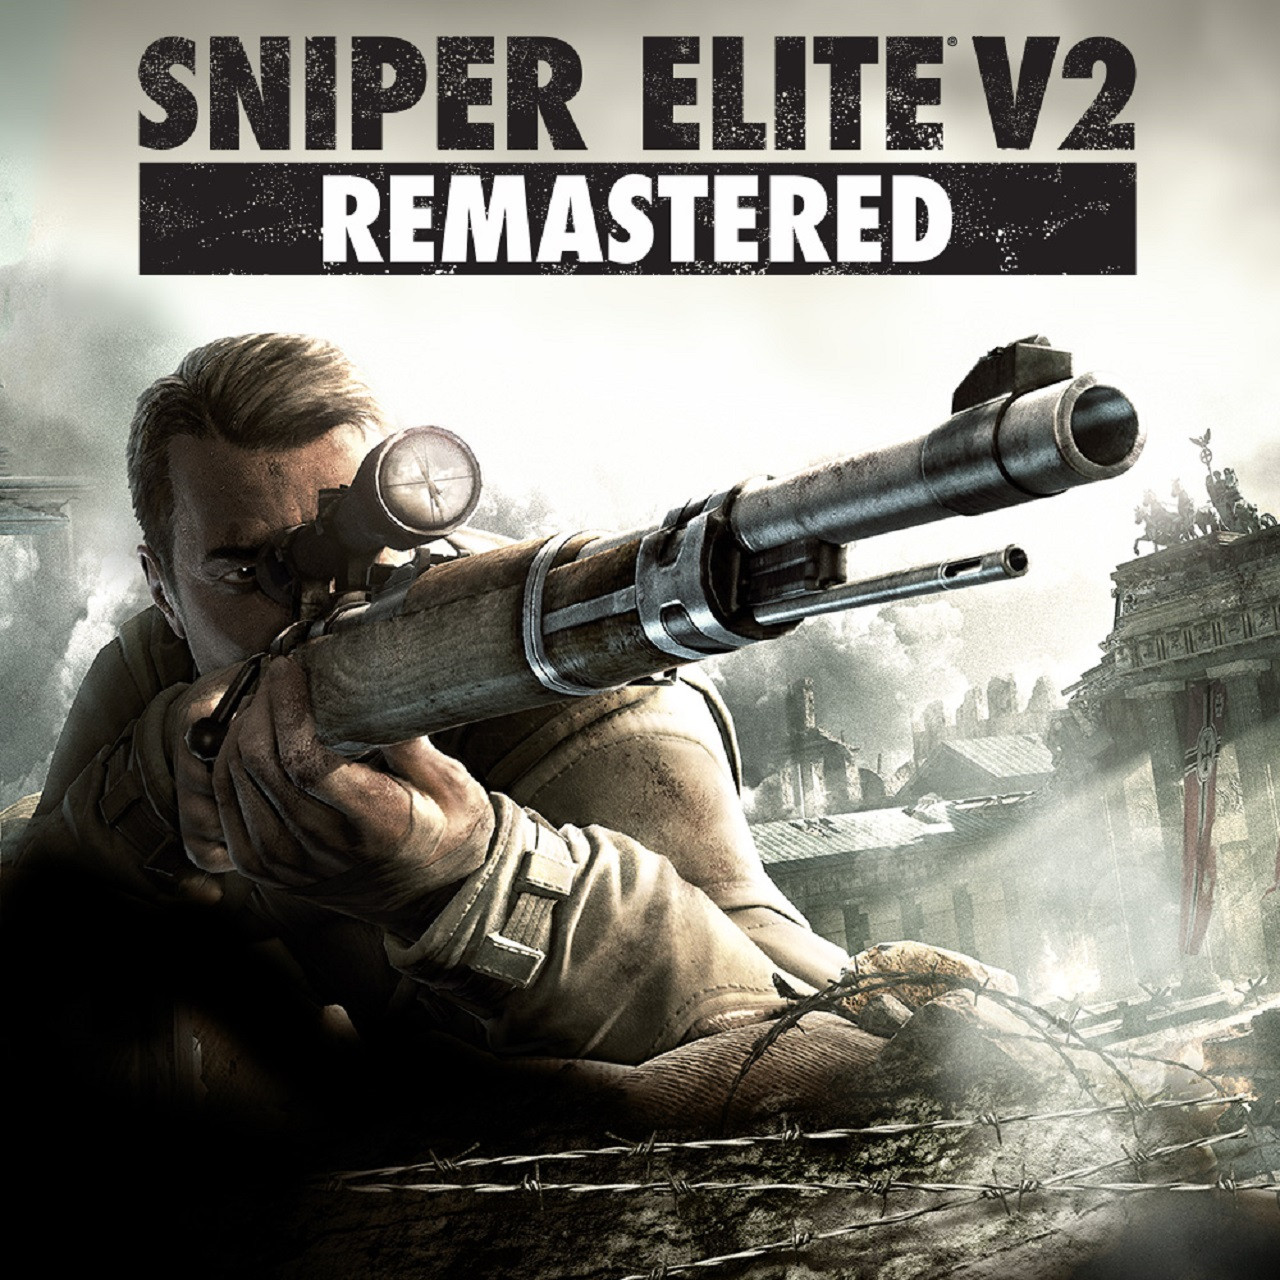 Sniper Elite V2 Remastered (російські субтитри) Nintendo Switch